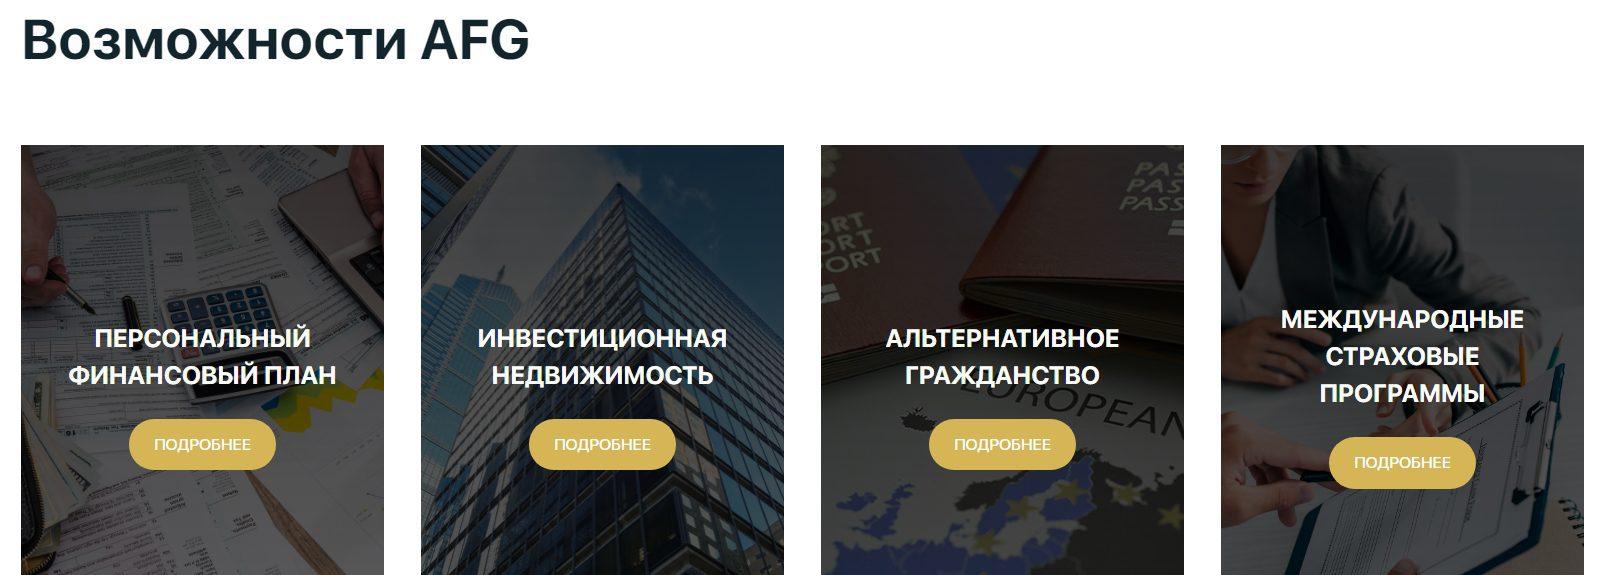 Врзможности Anderida Financial Group